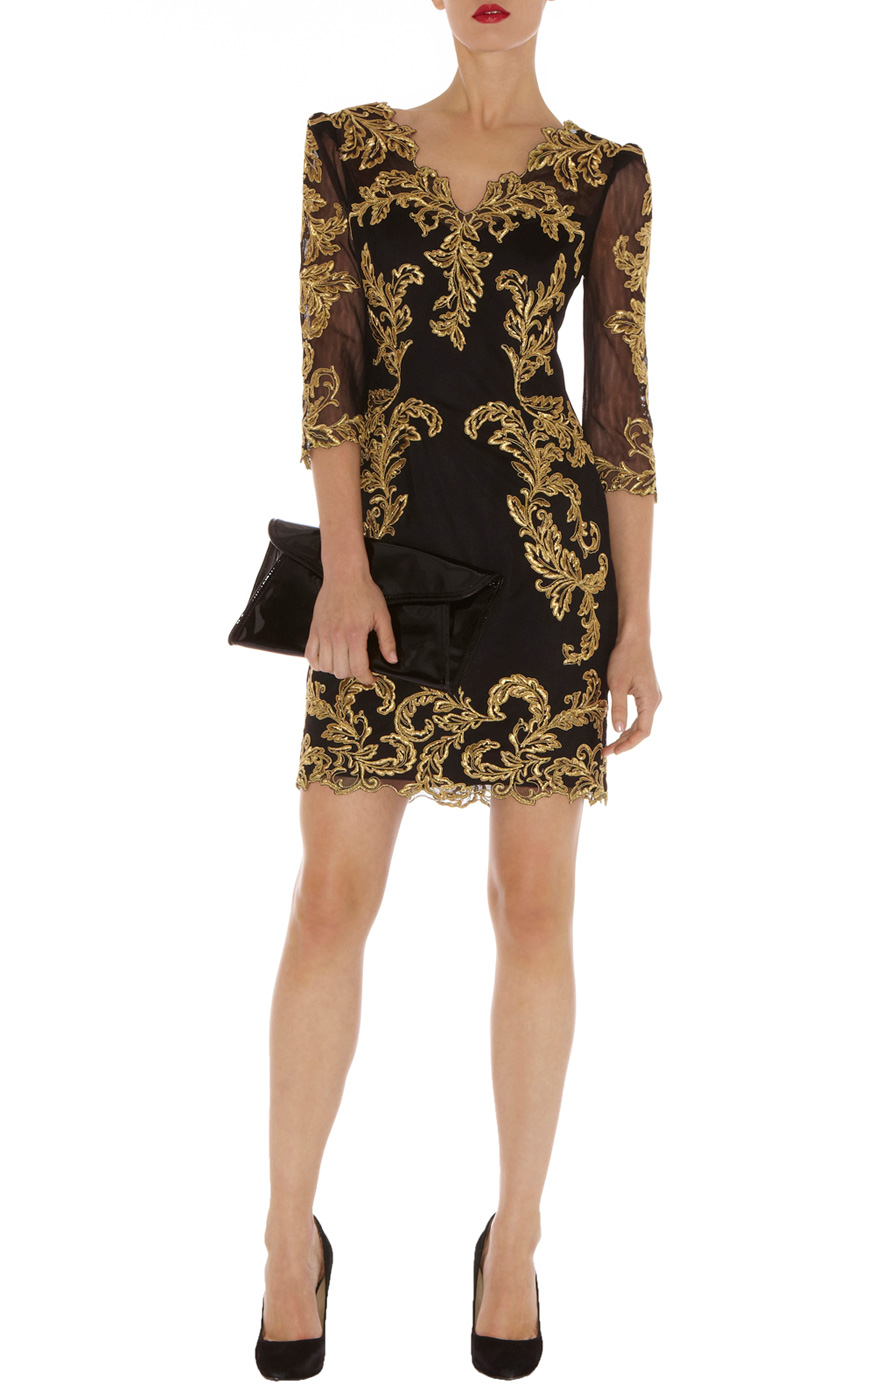 0579fc5e AfterDark | Black Baroque mesh dress | KarenMillen Stores Limited